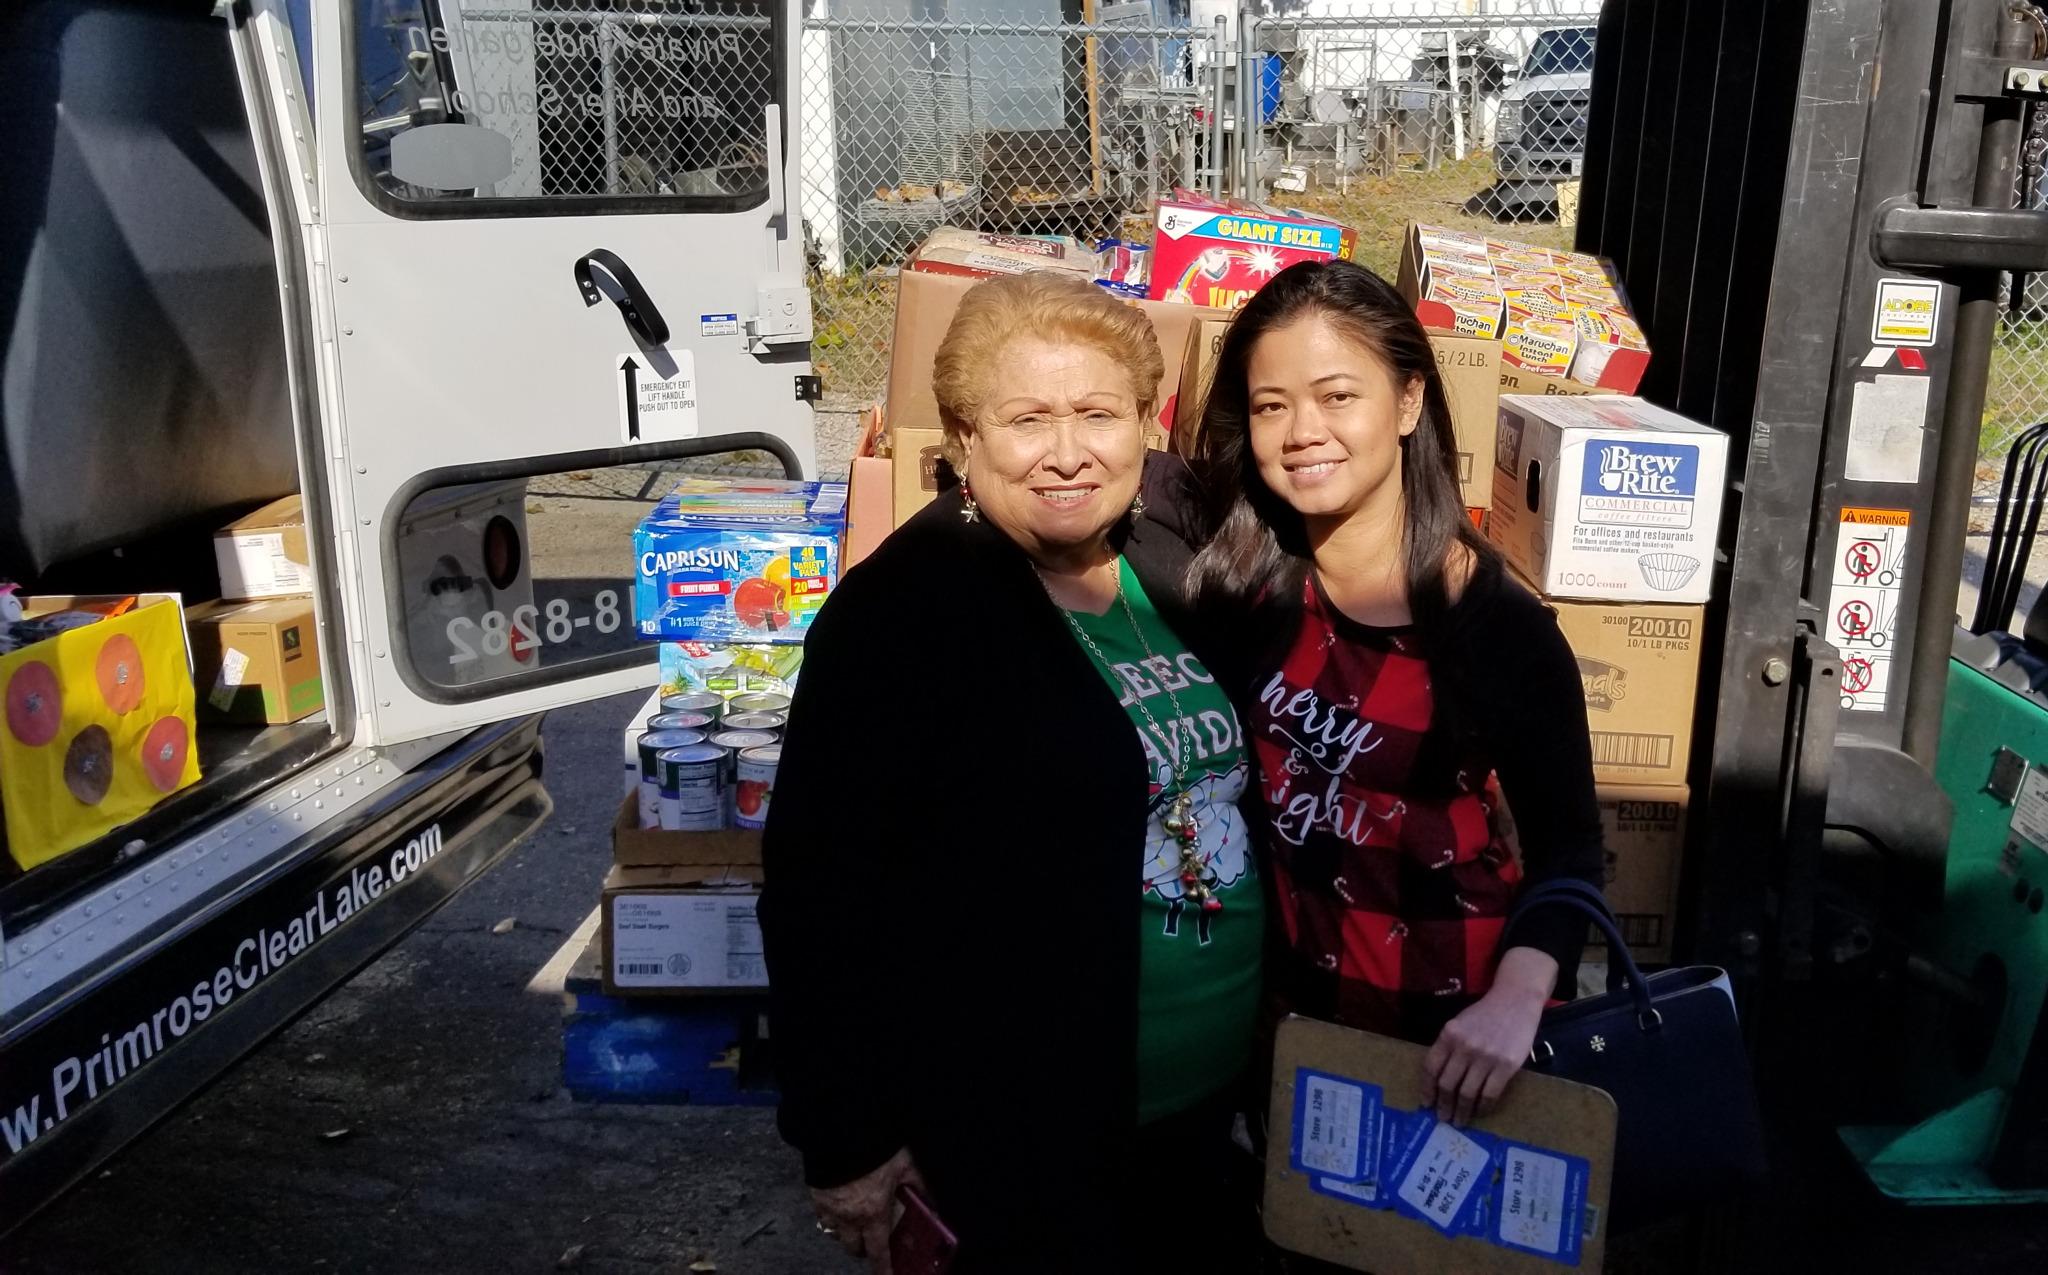 food bank, Galveston county, Clear Lake, daycare, child care, infant, toddler, preschool, pre-k, prekindergarten, giving back